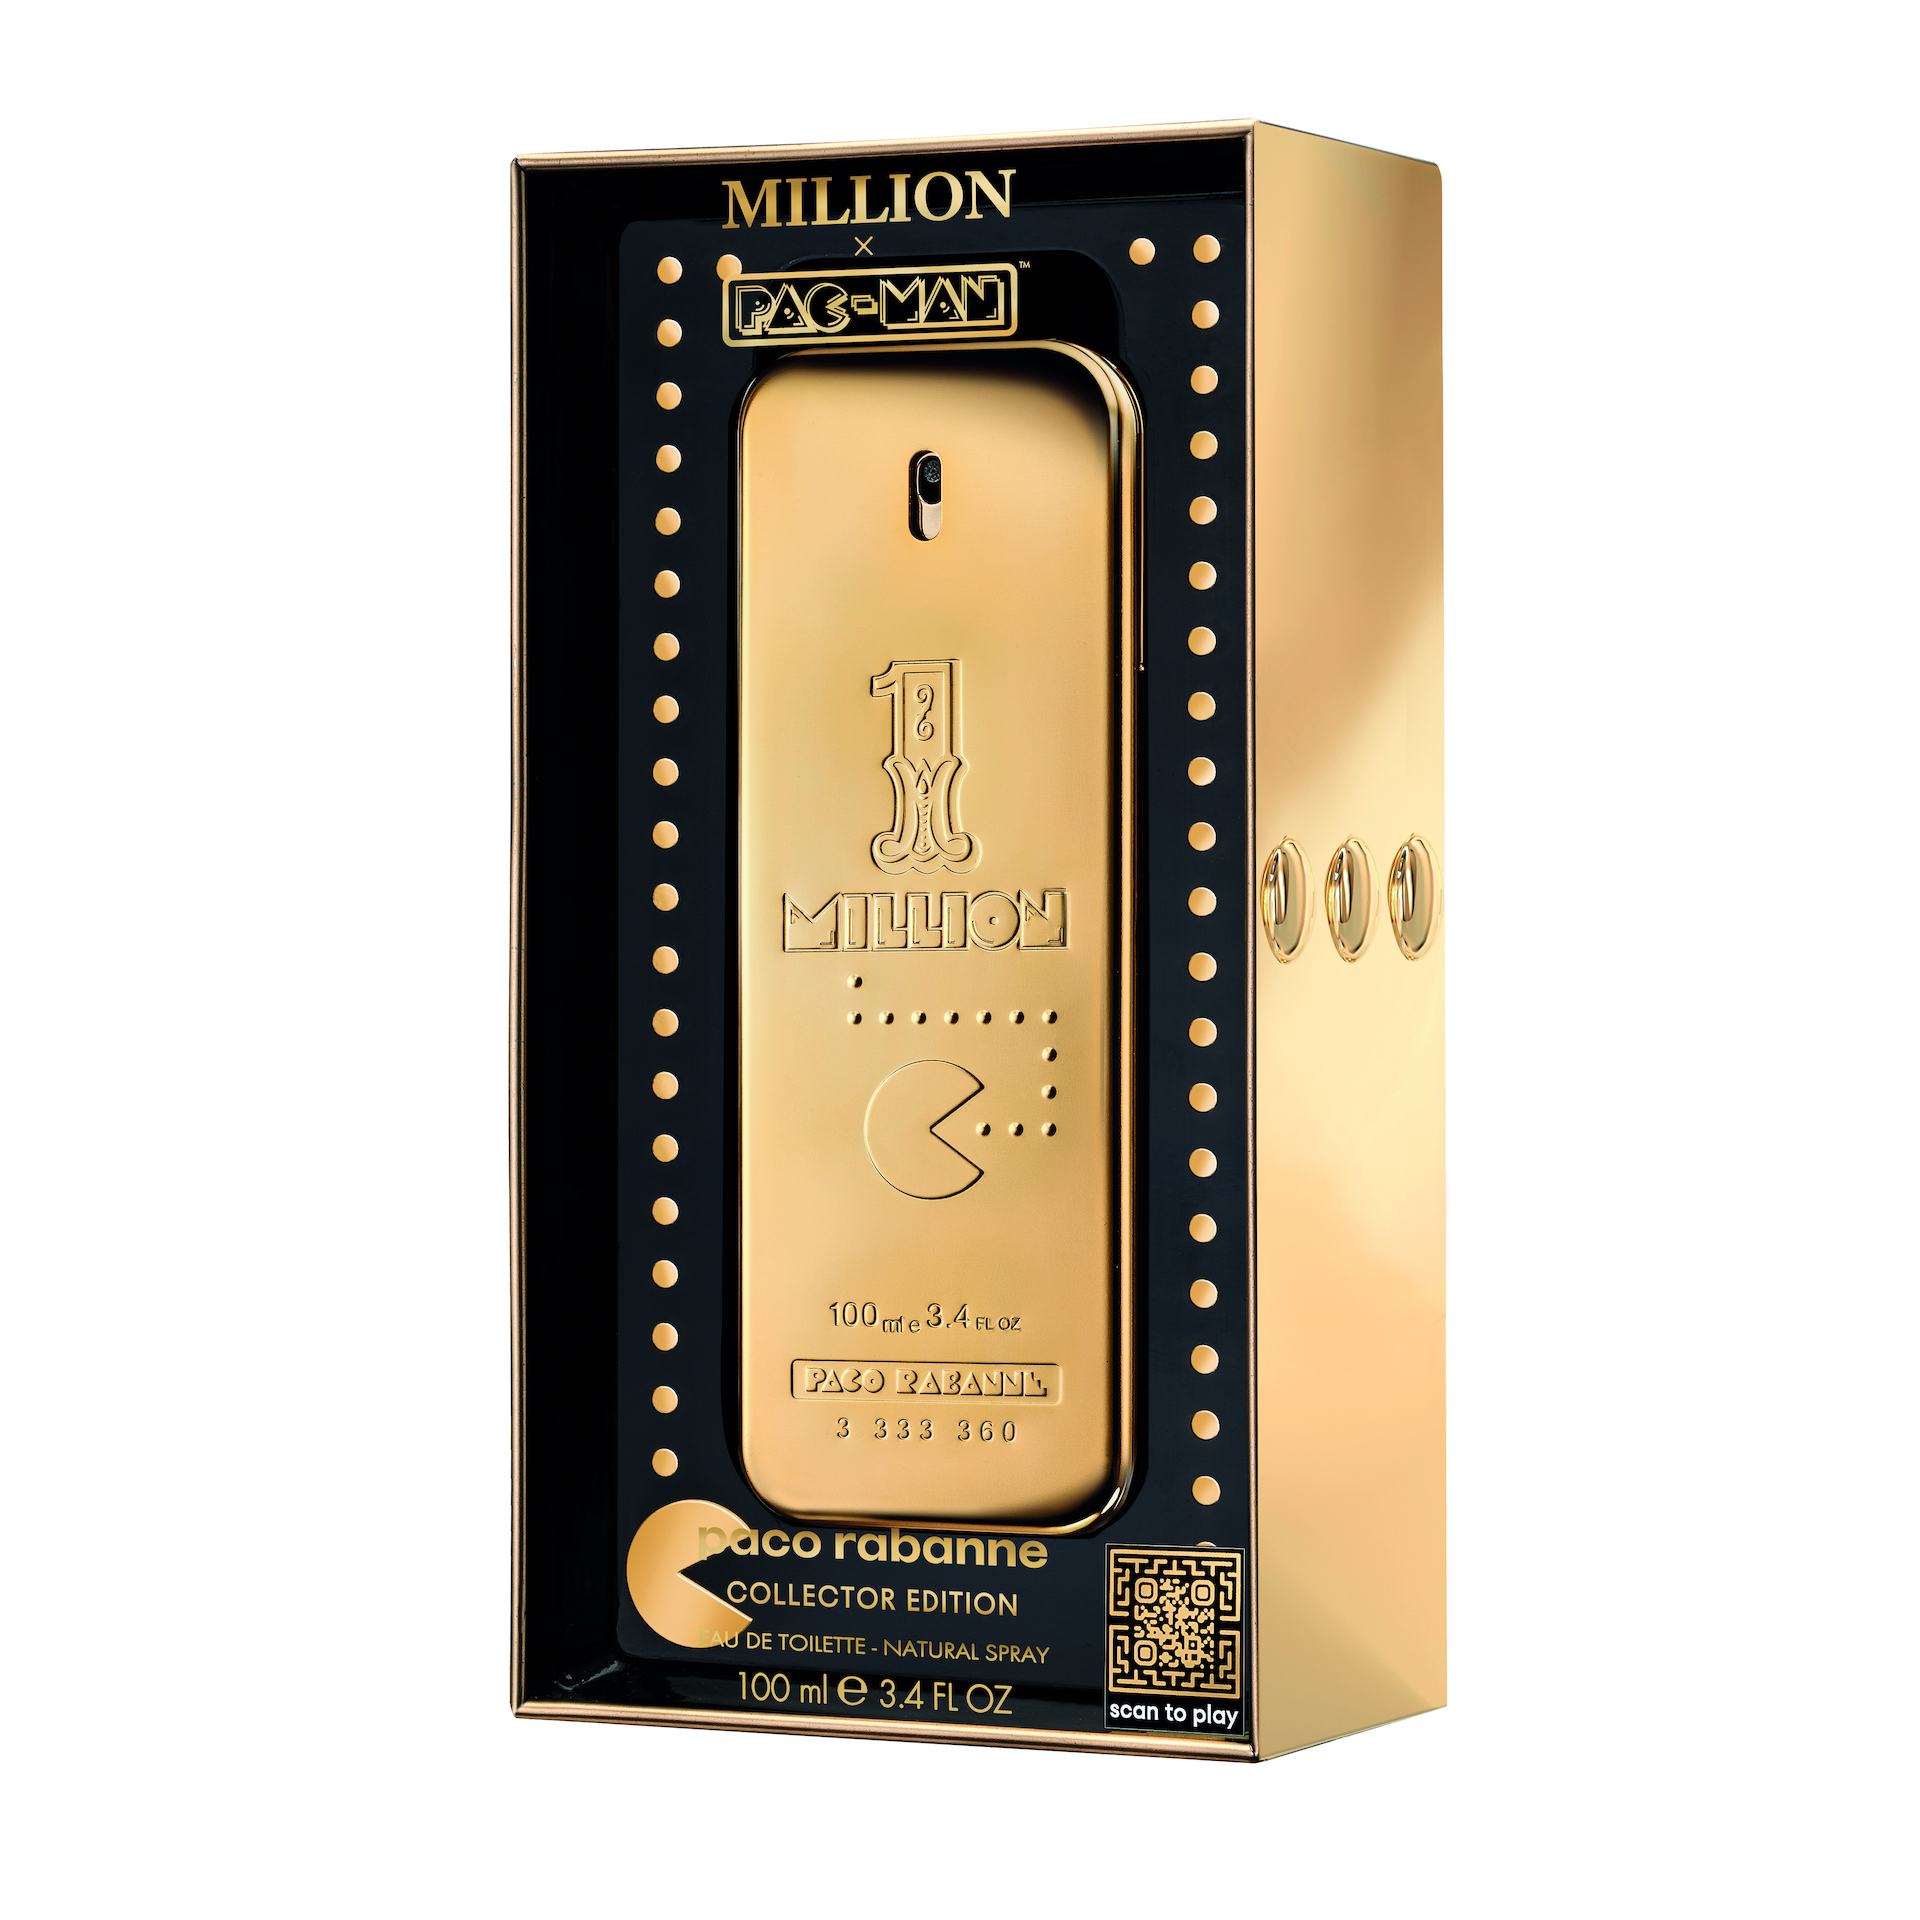 1Million Pacman Collector EDT 100ml